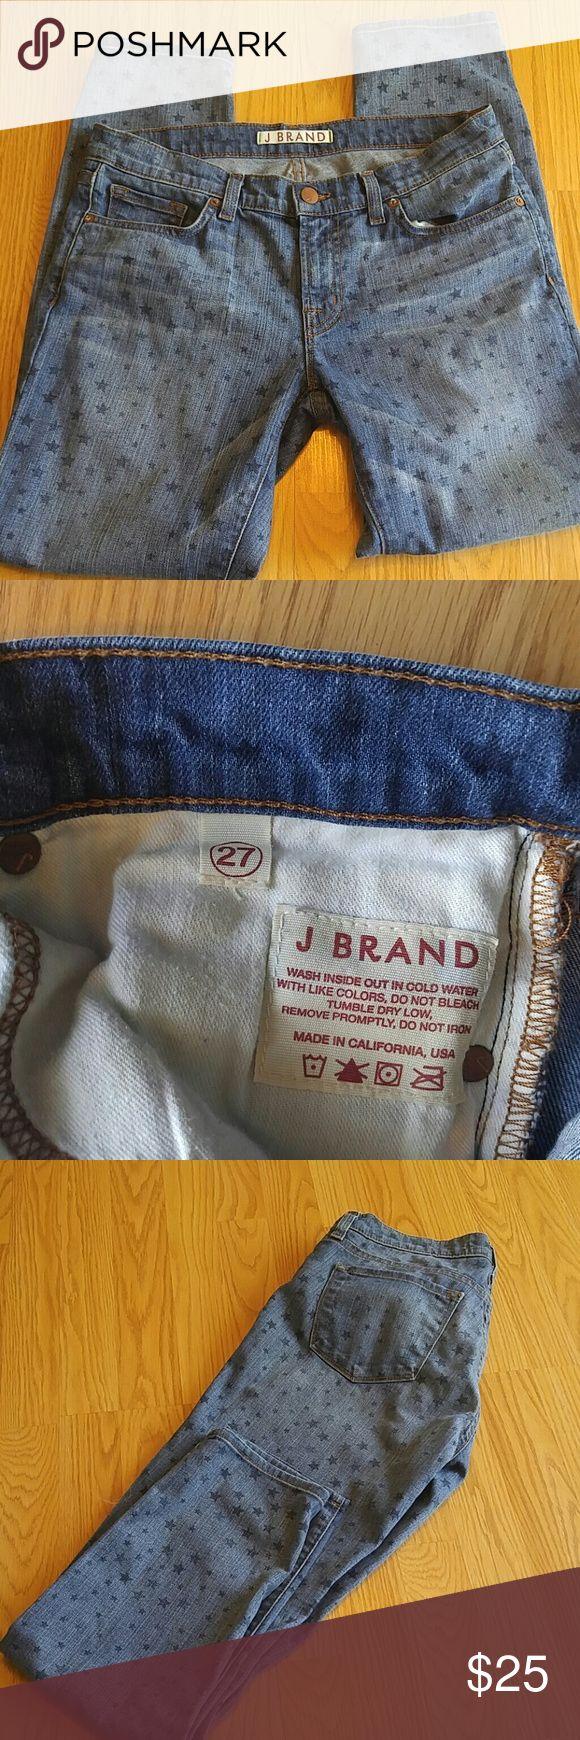 J Brand Star Print Skinny Jean Gently used J Brand Star Print Skinny Jean! Size 27, 28in inseam, 8in rise. Make me an offer or bundle to save! J Brand Jeans Skinny